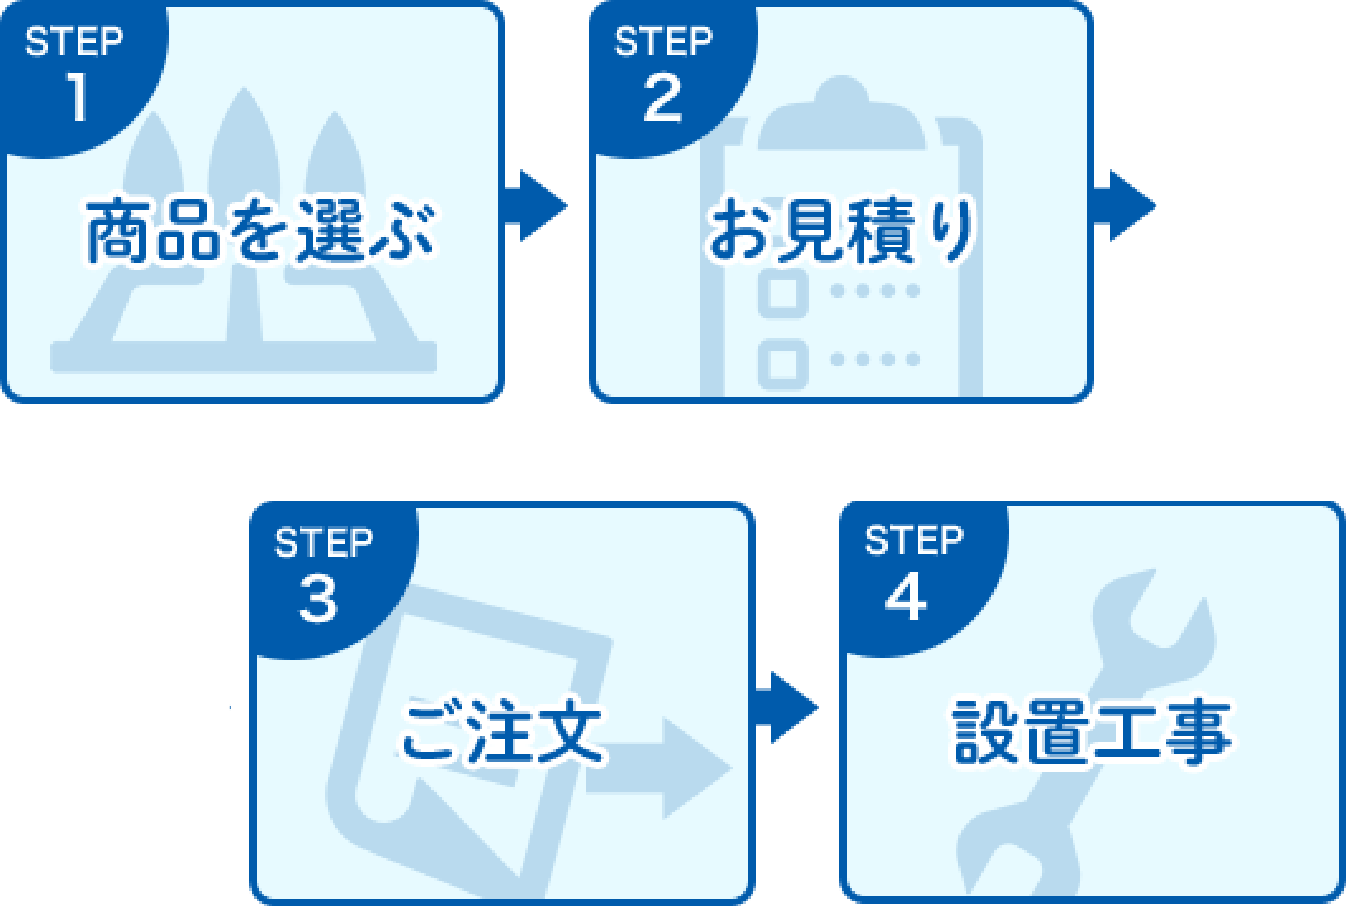 STEP1商品を選ぶ STEP2お見積り STEP3ご注文 STEP4設置工事